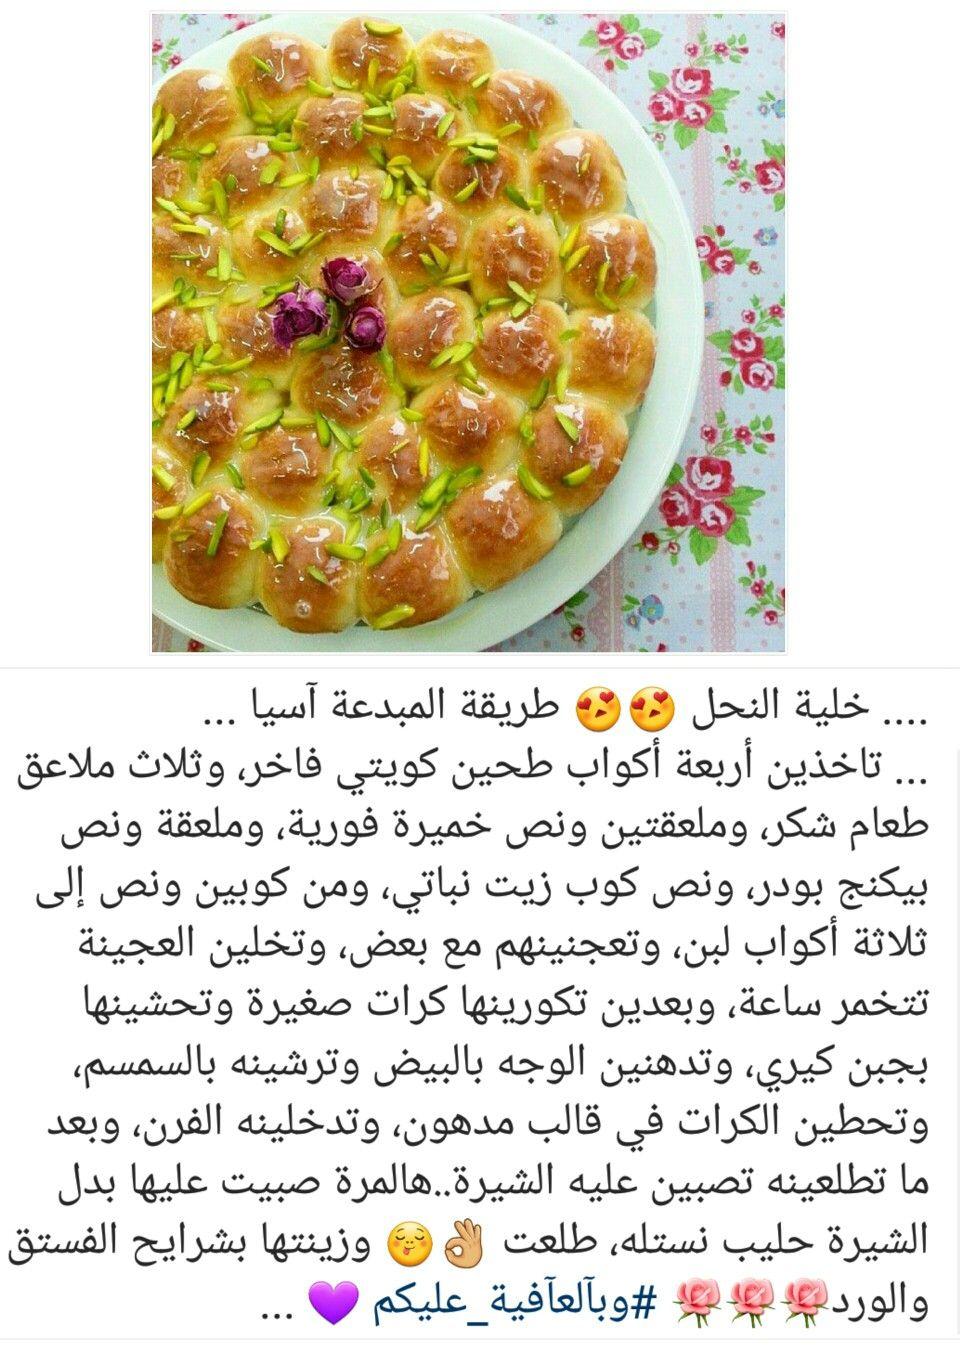 Pin By Jiji Abab On أكلات مصوره Tunisian Food Food Good Food